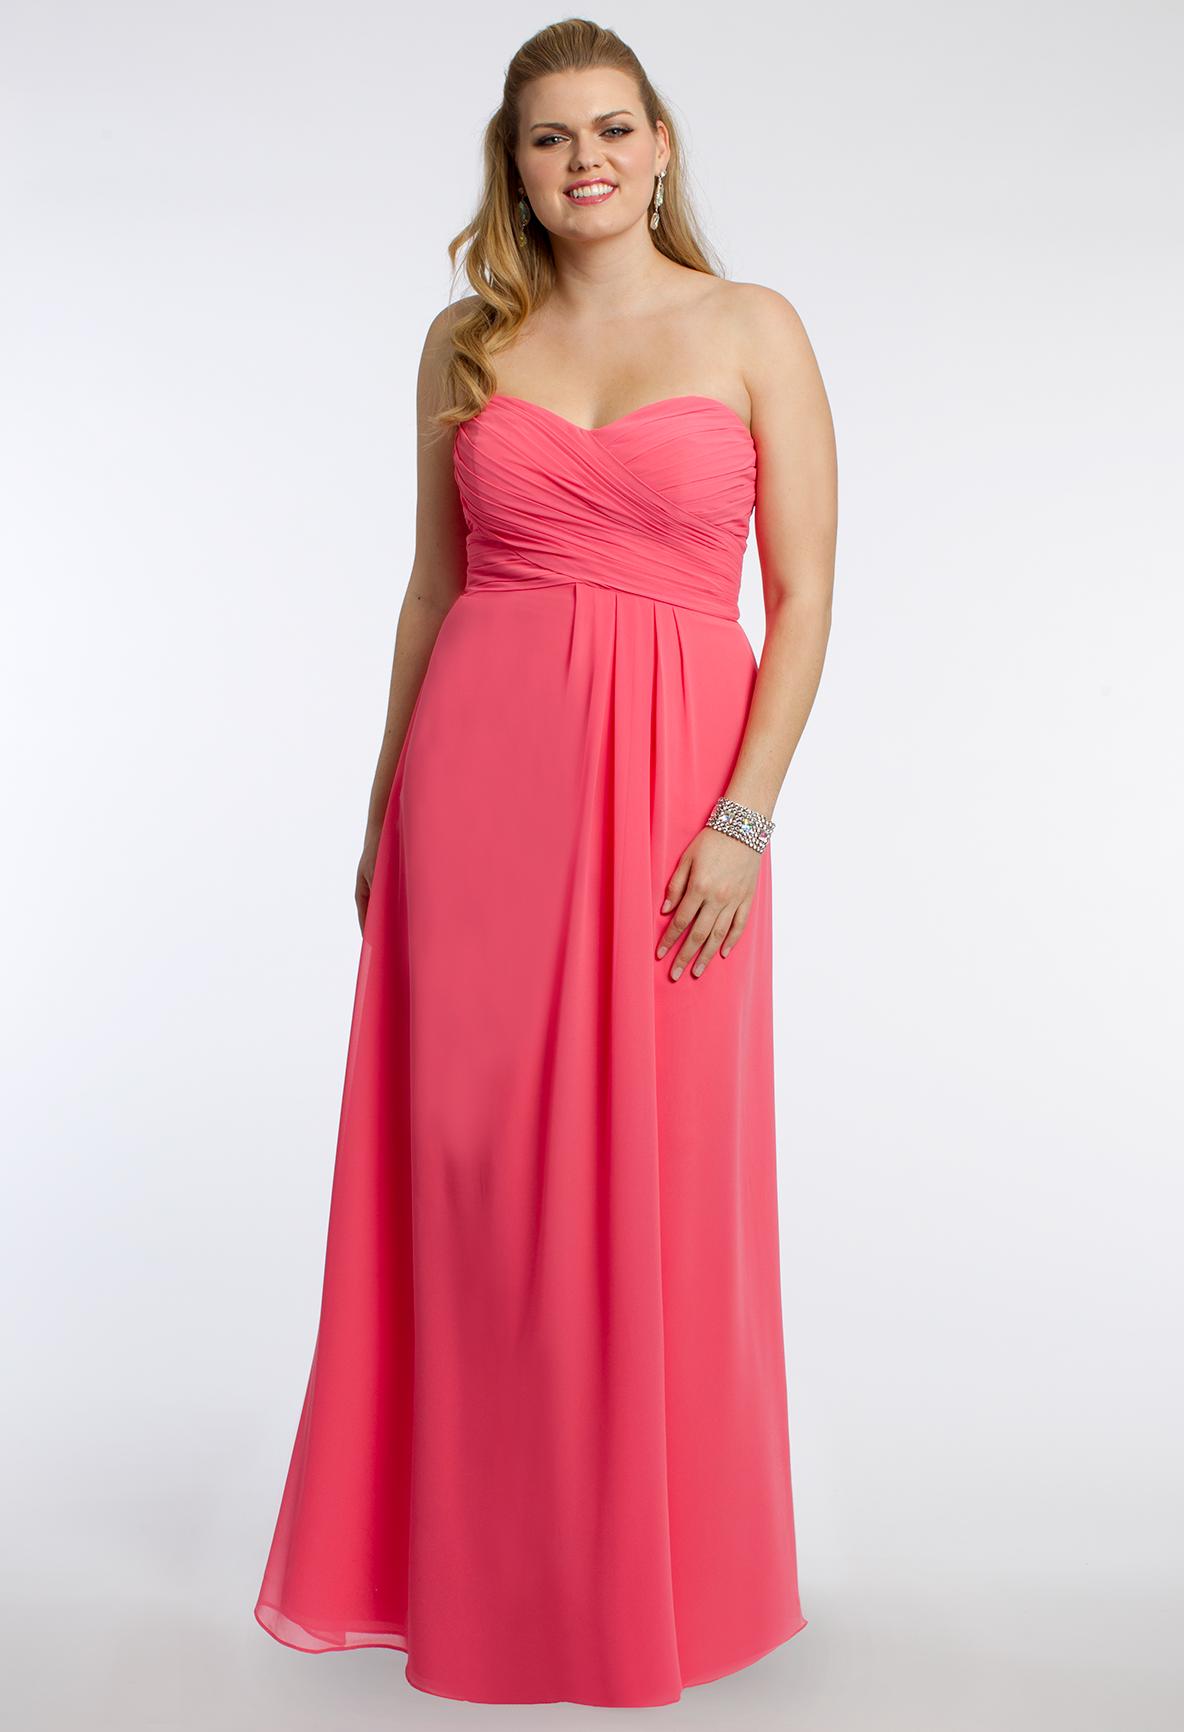 Strapless crisscross bodice dress bodice prom and lilacs